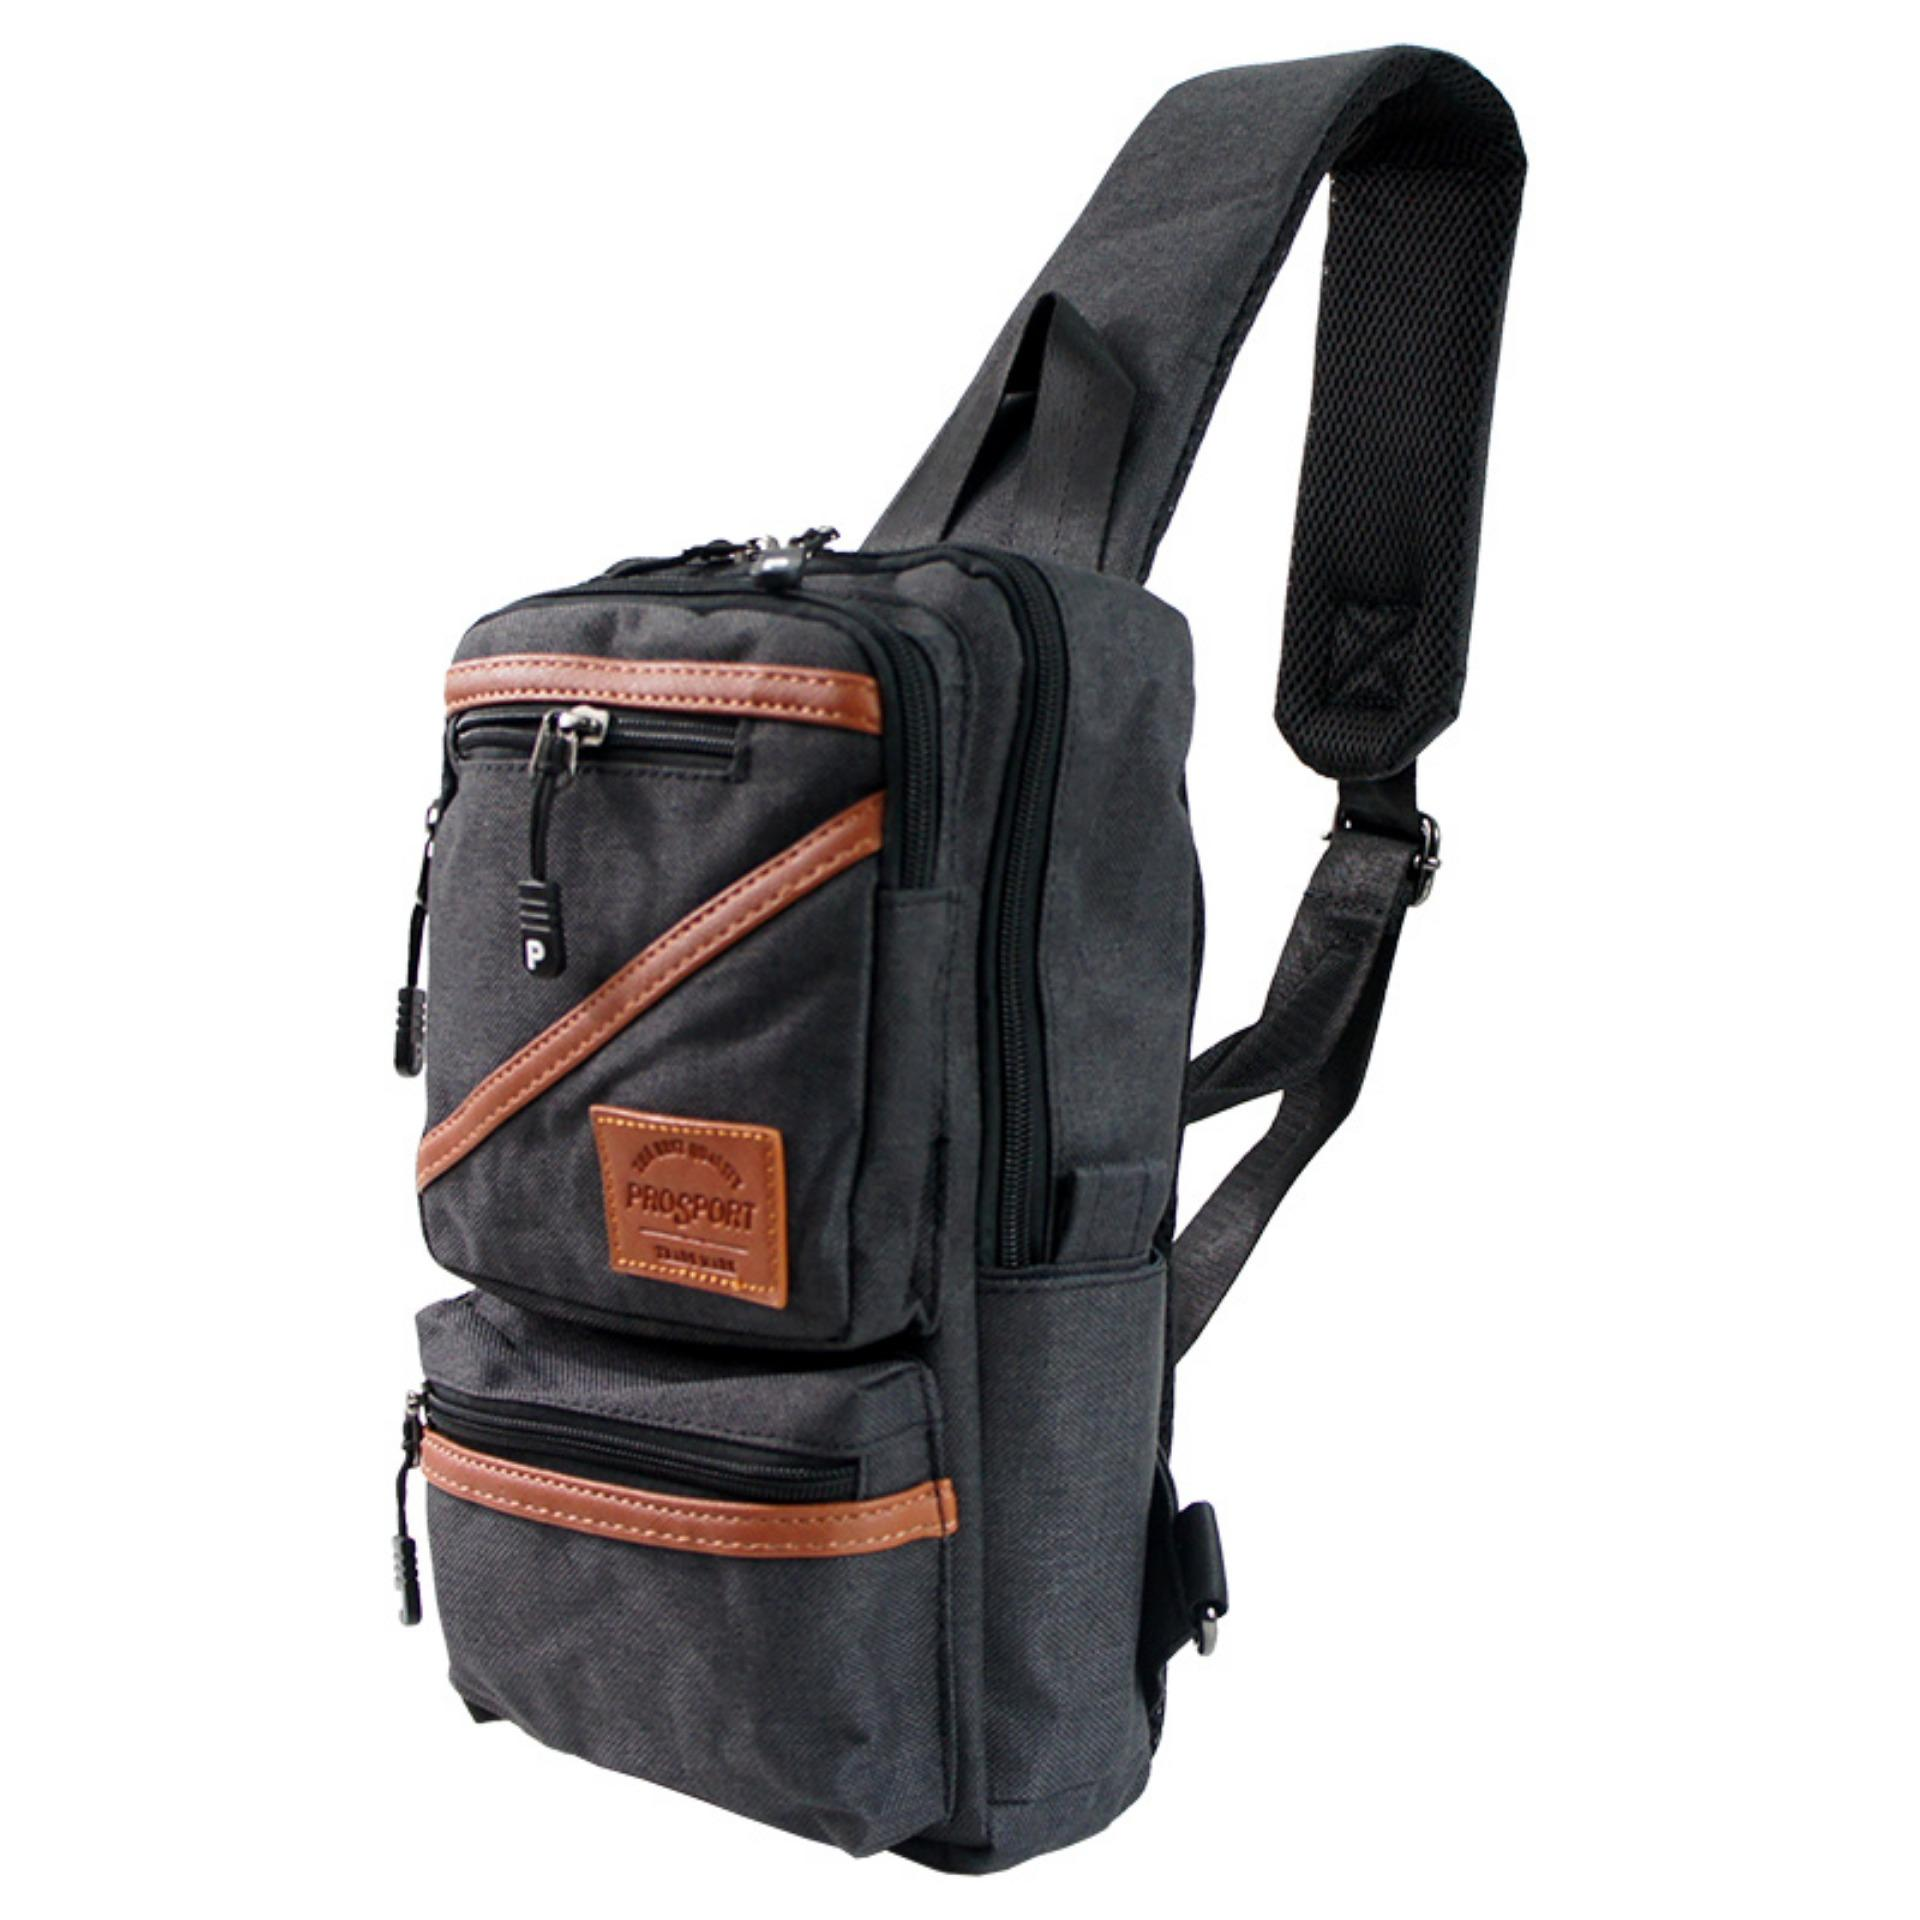 Real Polo Tas Ransel Kasual 6276 Backpack Daypack Biru Best Buy 6363 Hijau Free Bag Cover Pria Hitam Source Strap